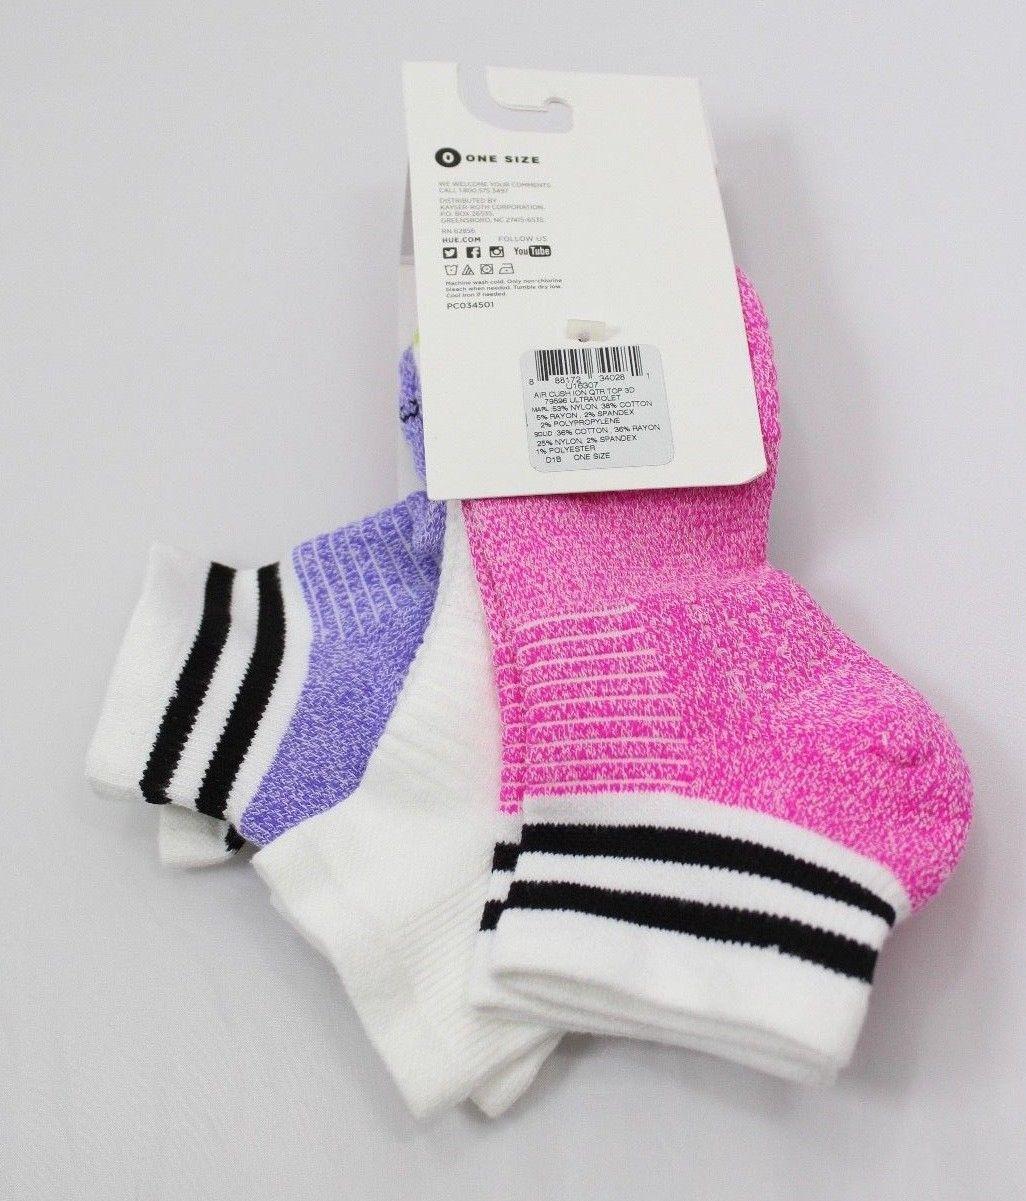 HUE 3-pairs Air Sleek Quarter-Top Cushioned Socks Ultraviolet Pack